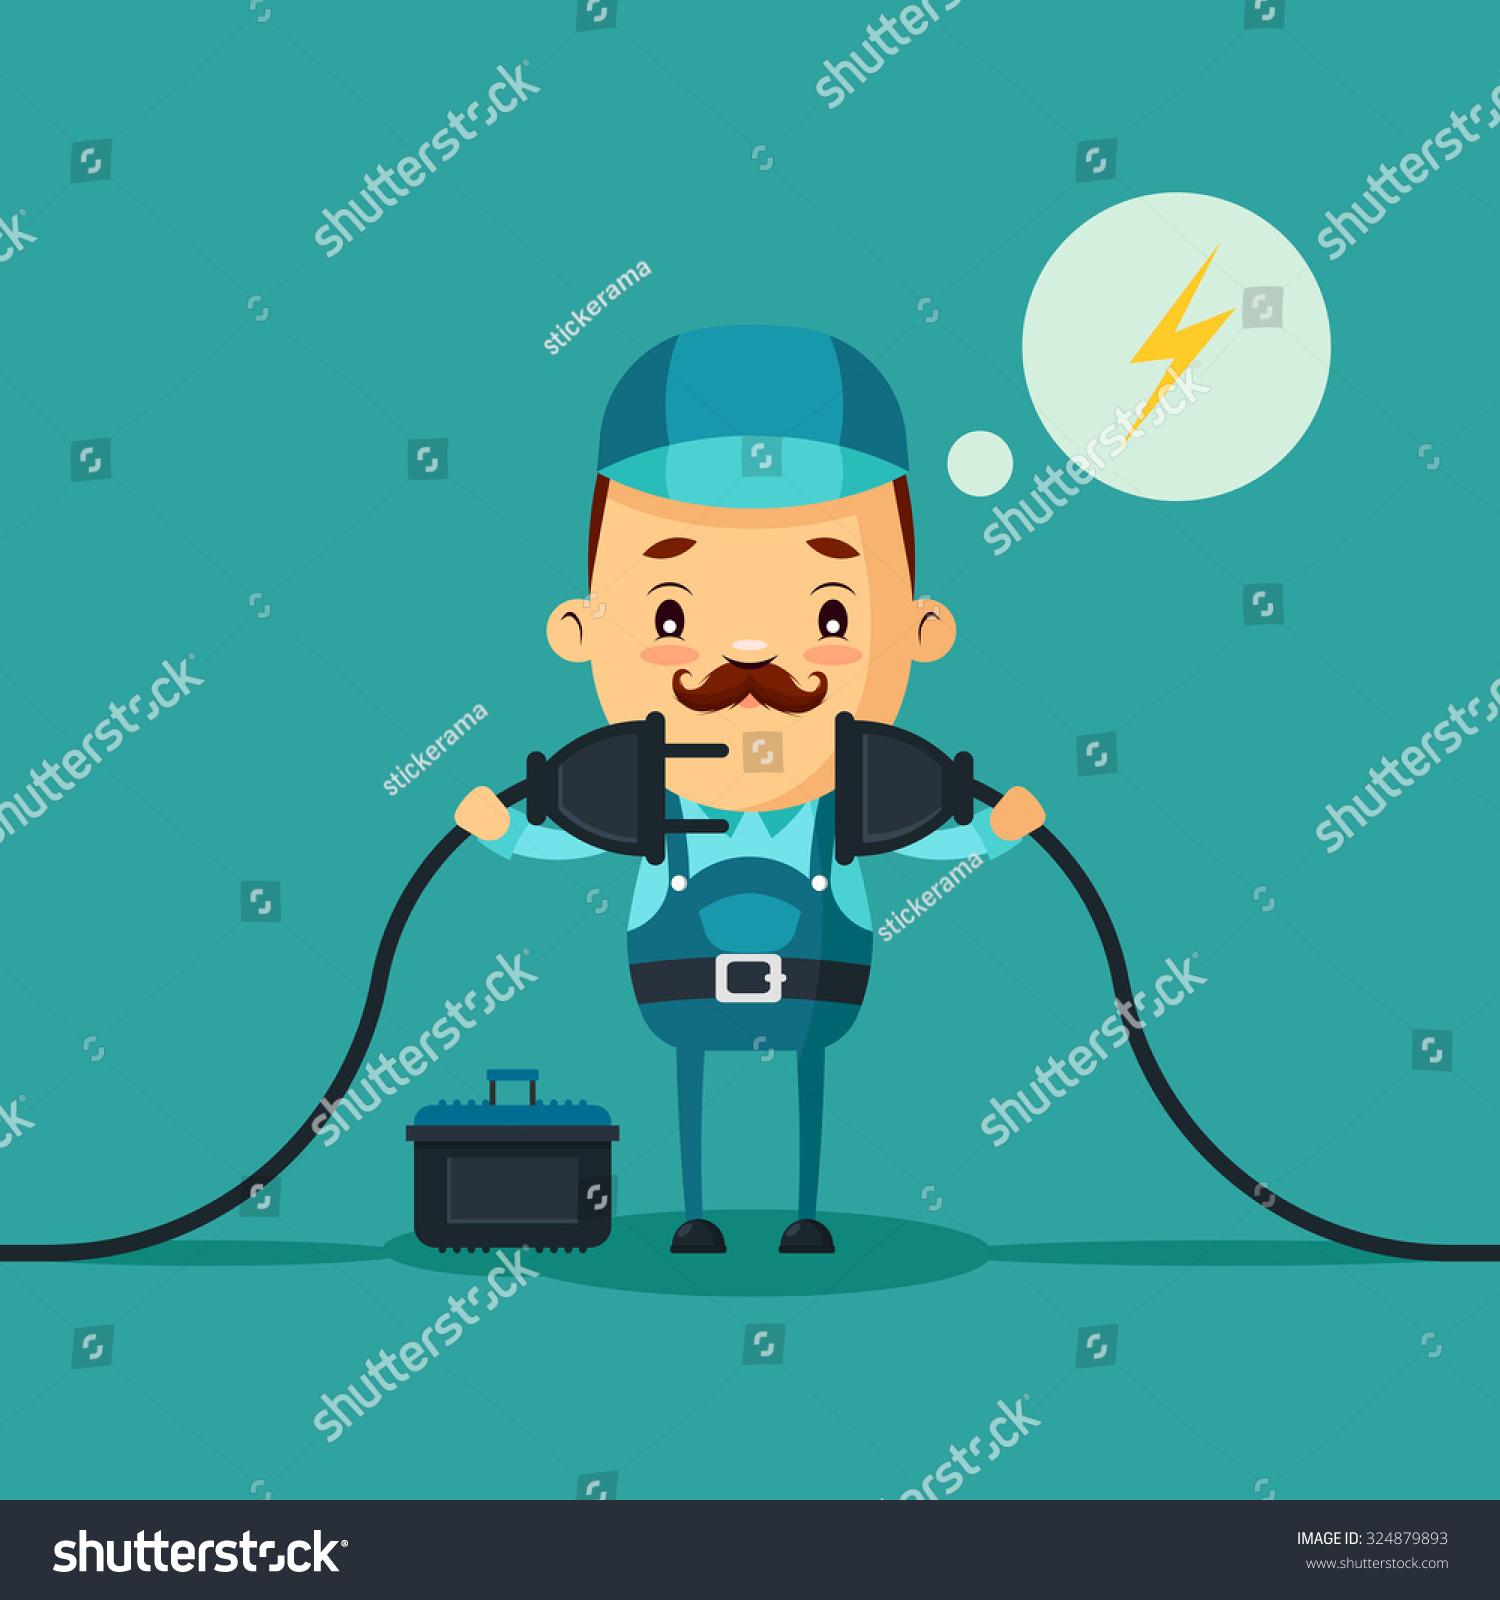 Cartoon Power Cord : Cute cartoon electrician connecting power cord stock